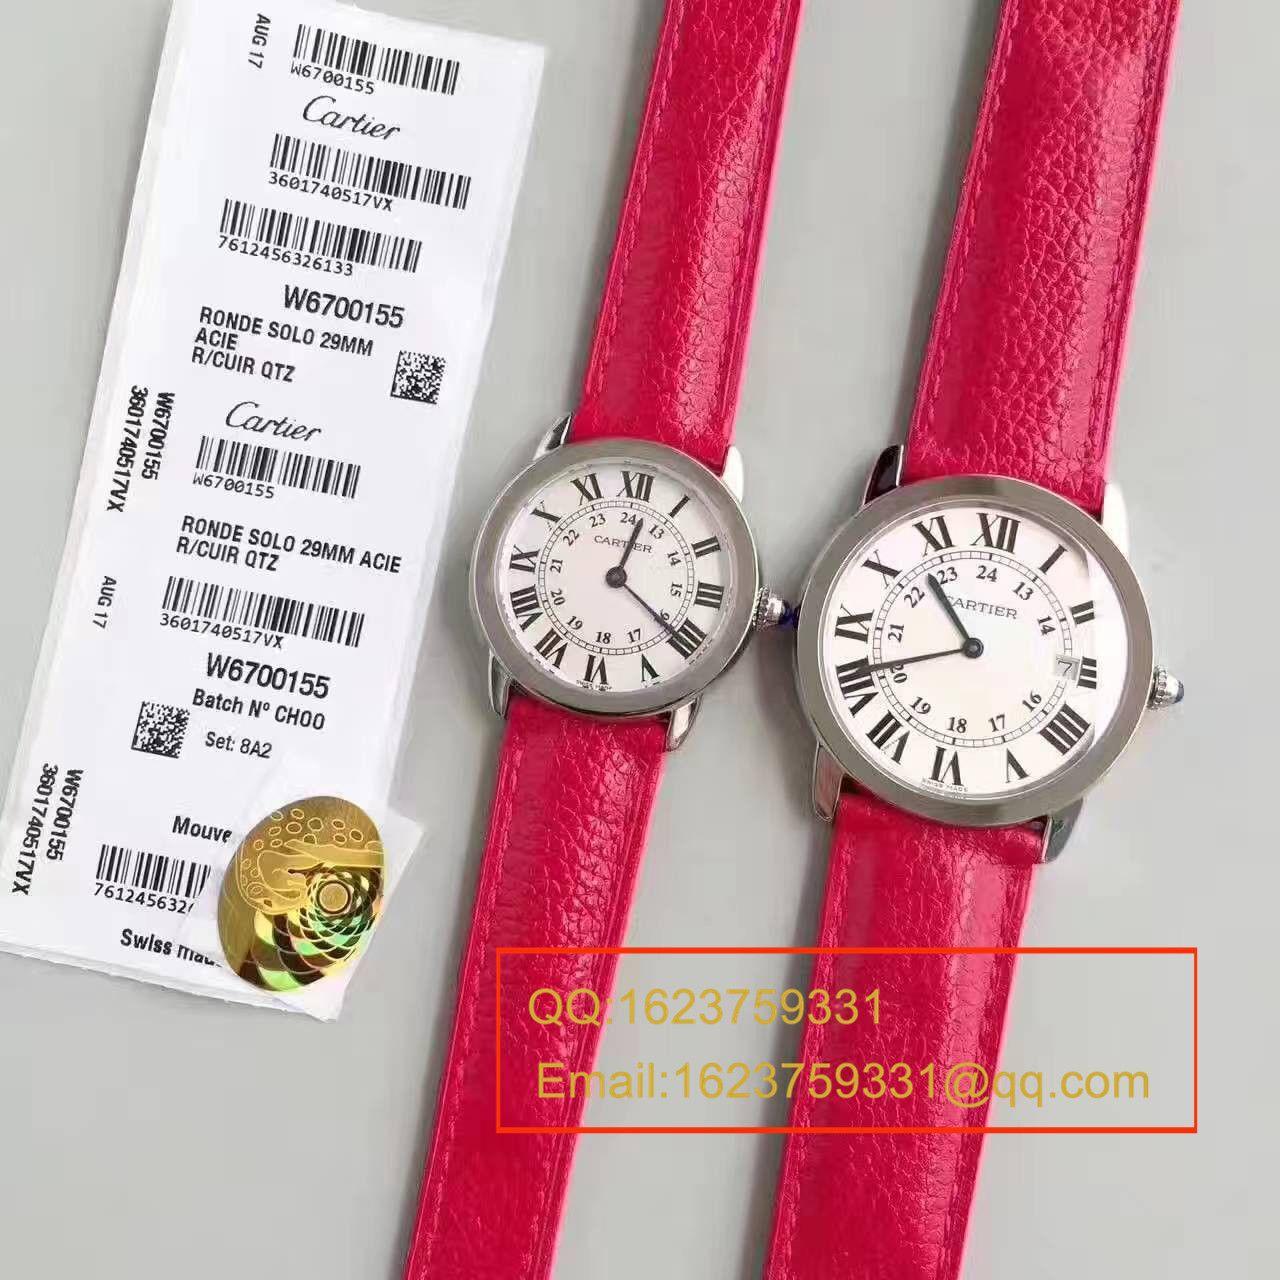 【K11厂正品开模顶级复刻手表】卡地亚RONDE DE CARTIER伦敦SOLO系列W6700155、W6700255女士石英腕表 / KAD078